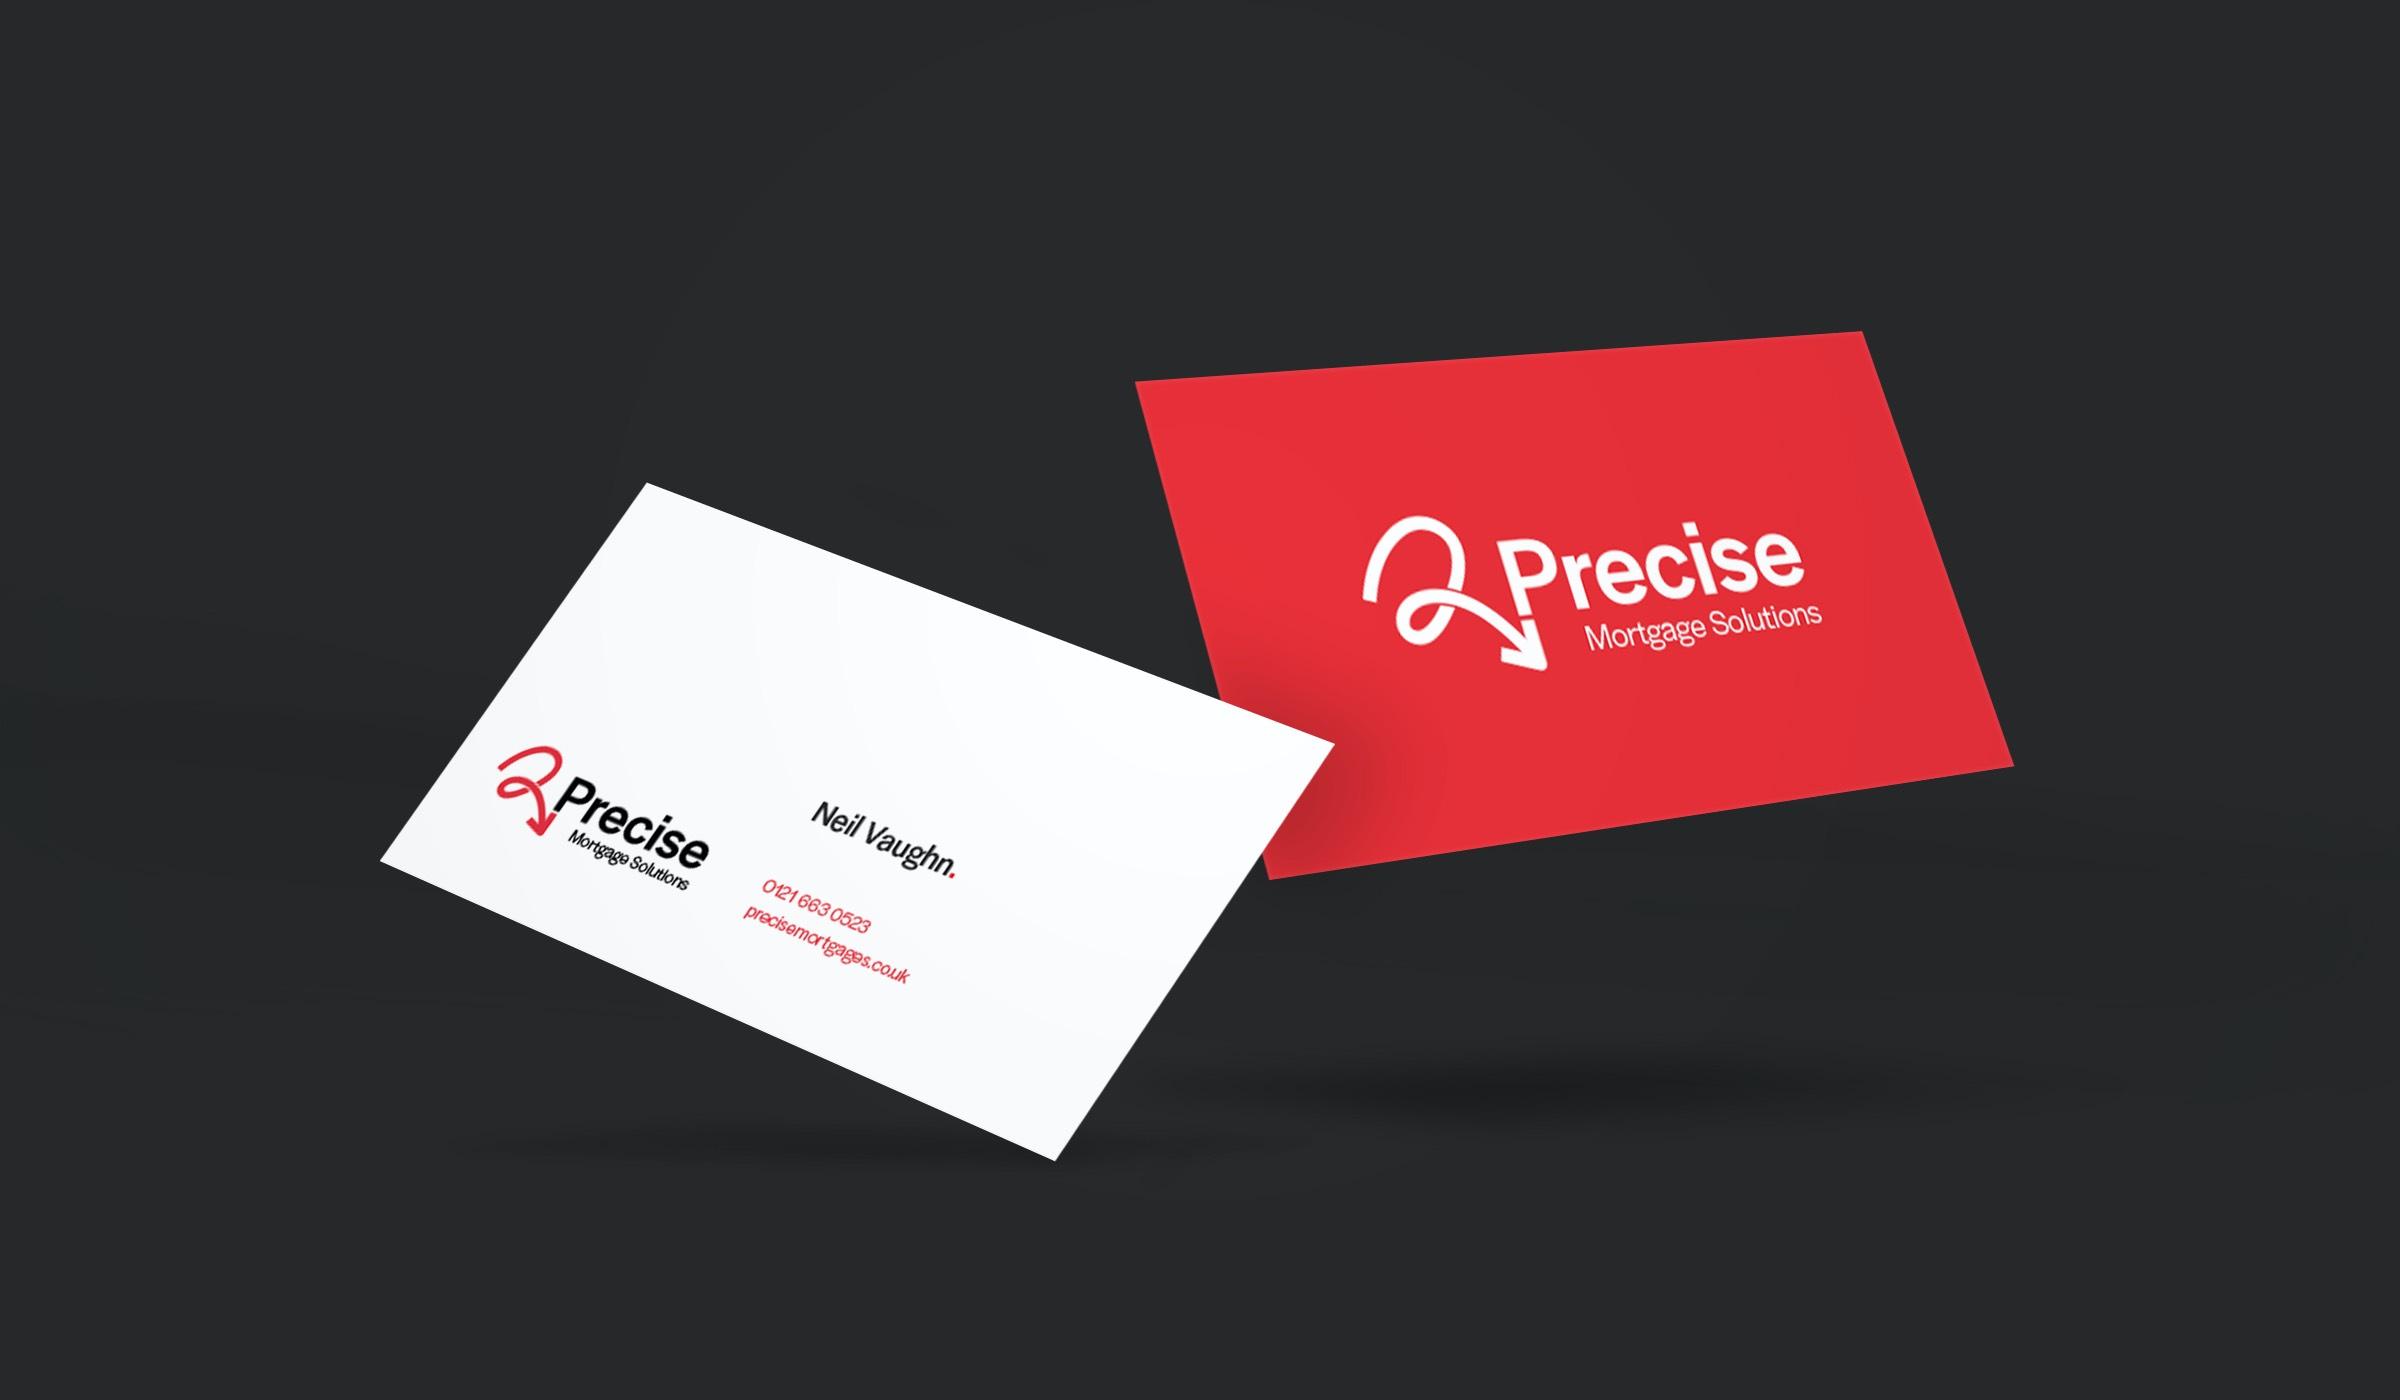 Precise Business Card Design